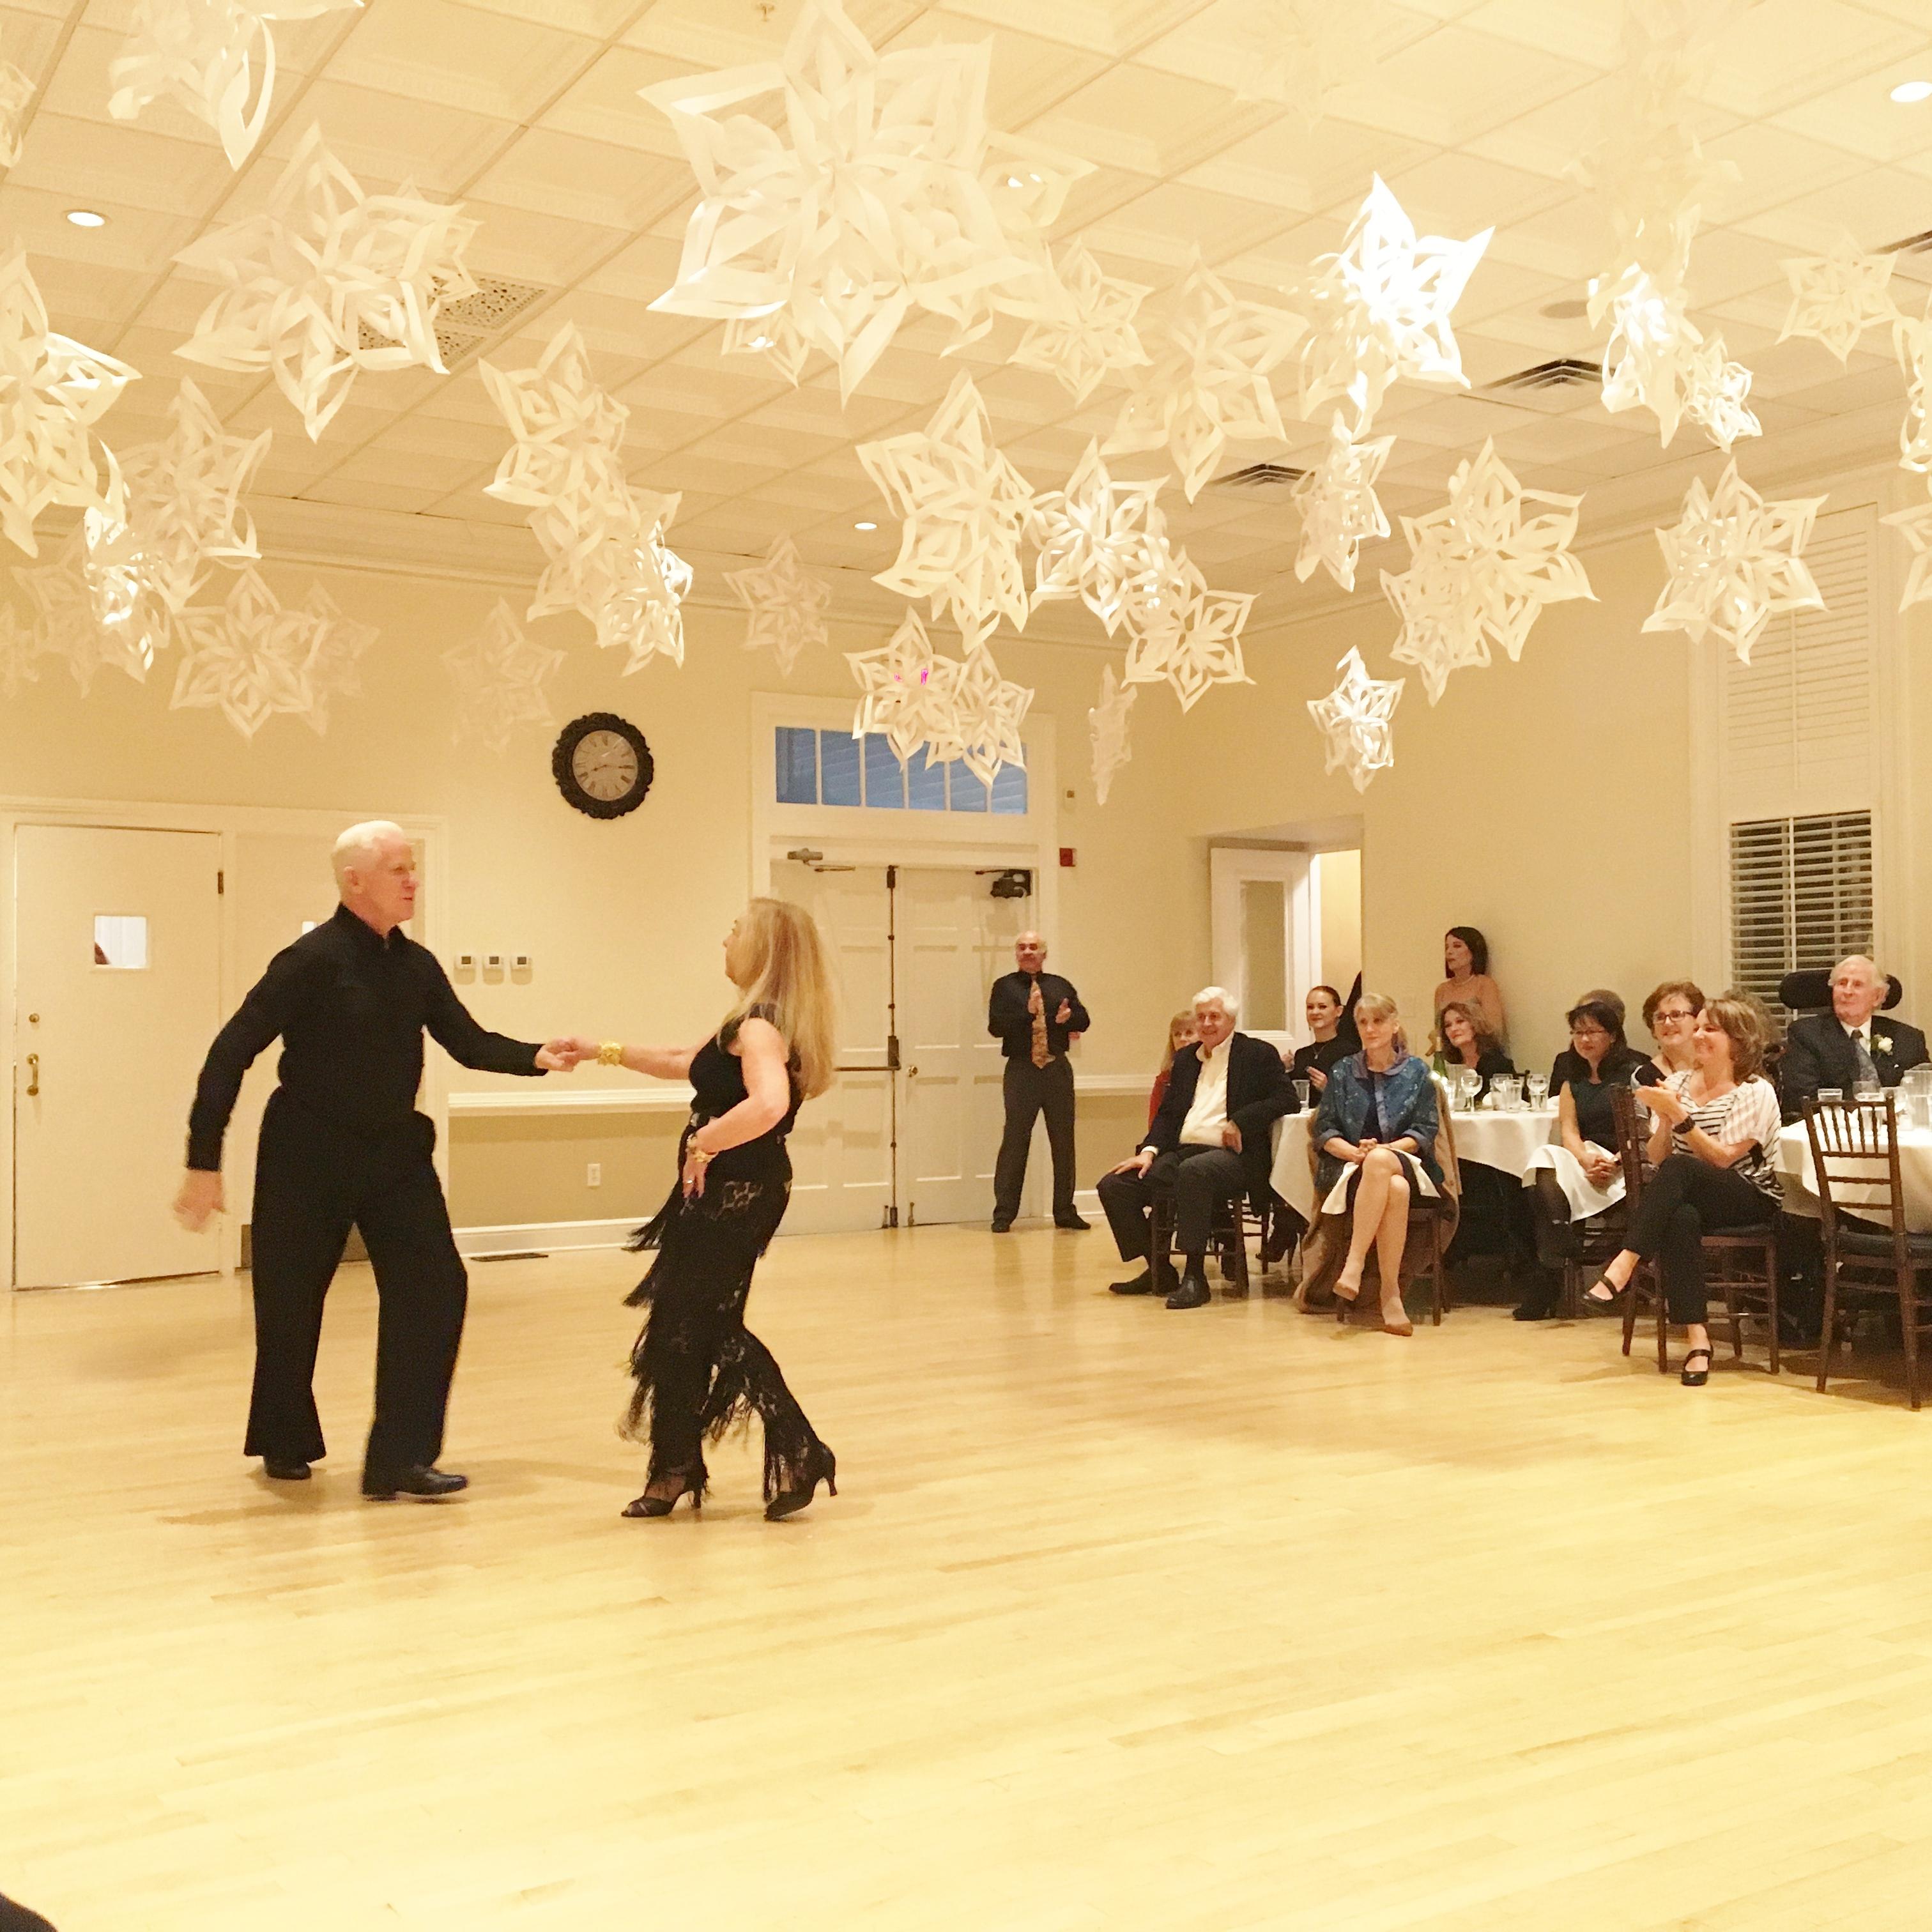 In The Mood - Ballroom Dancing (5)